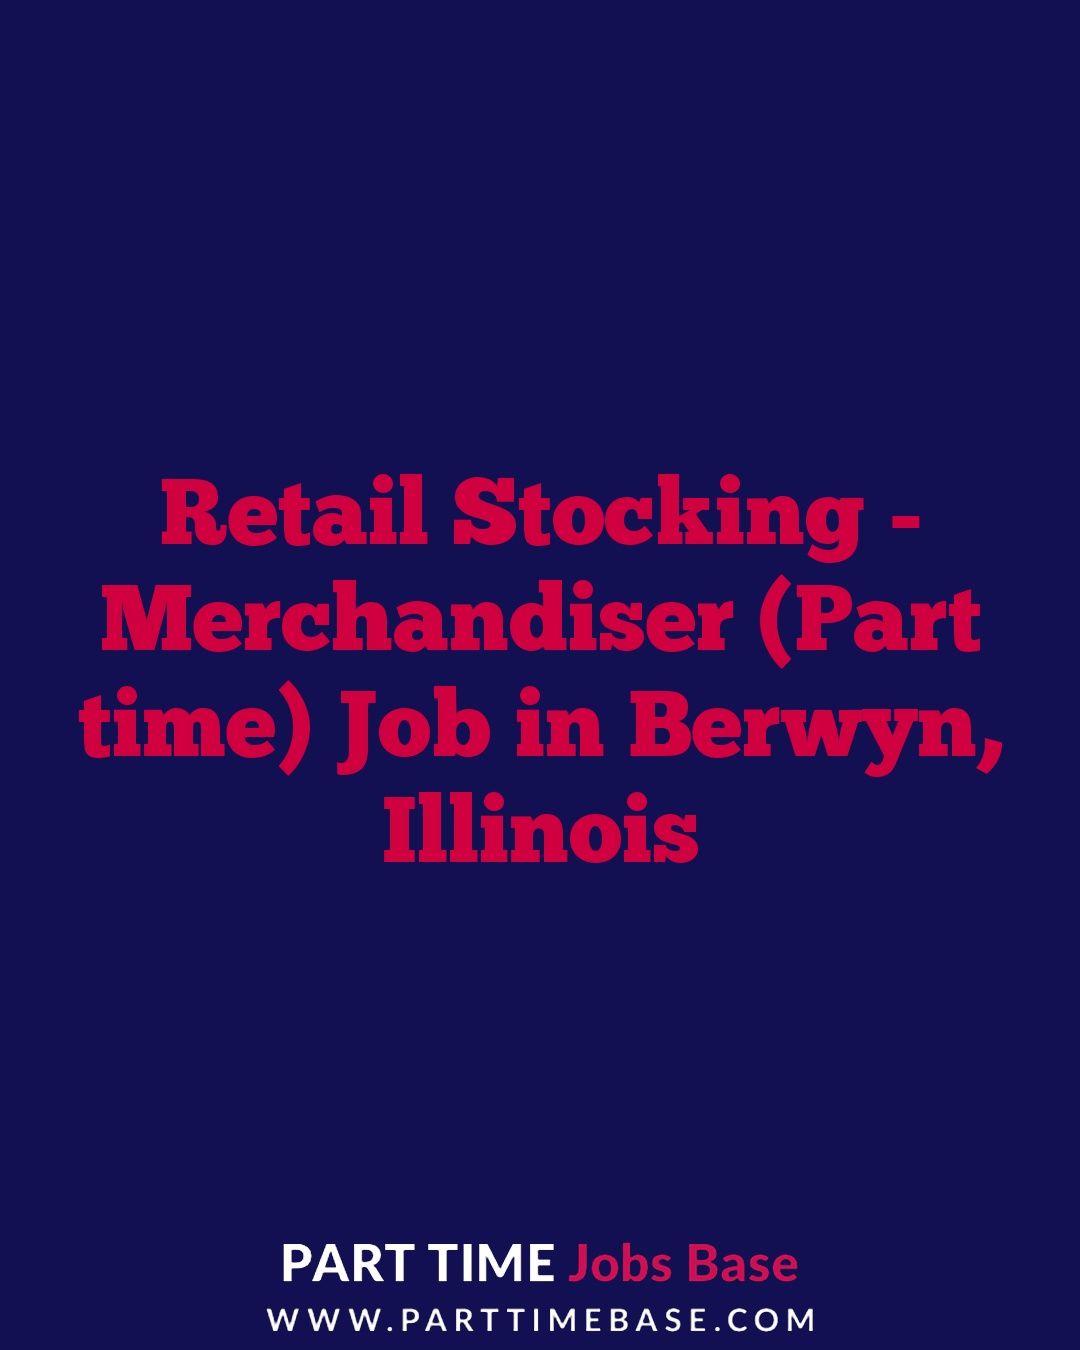 Retail Stocking Merchandiser Part Time Job In Berwyn Parttime